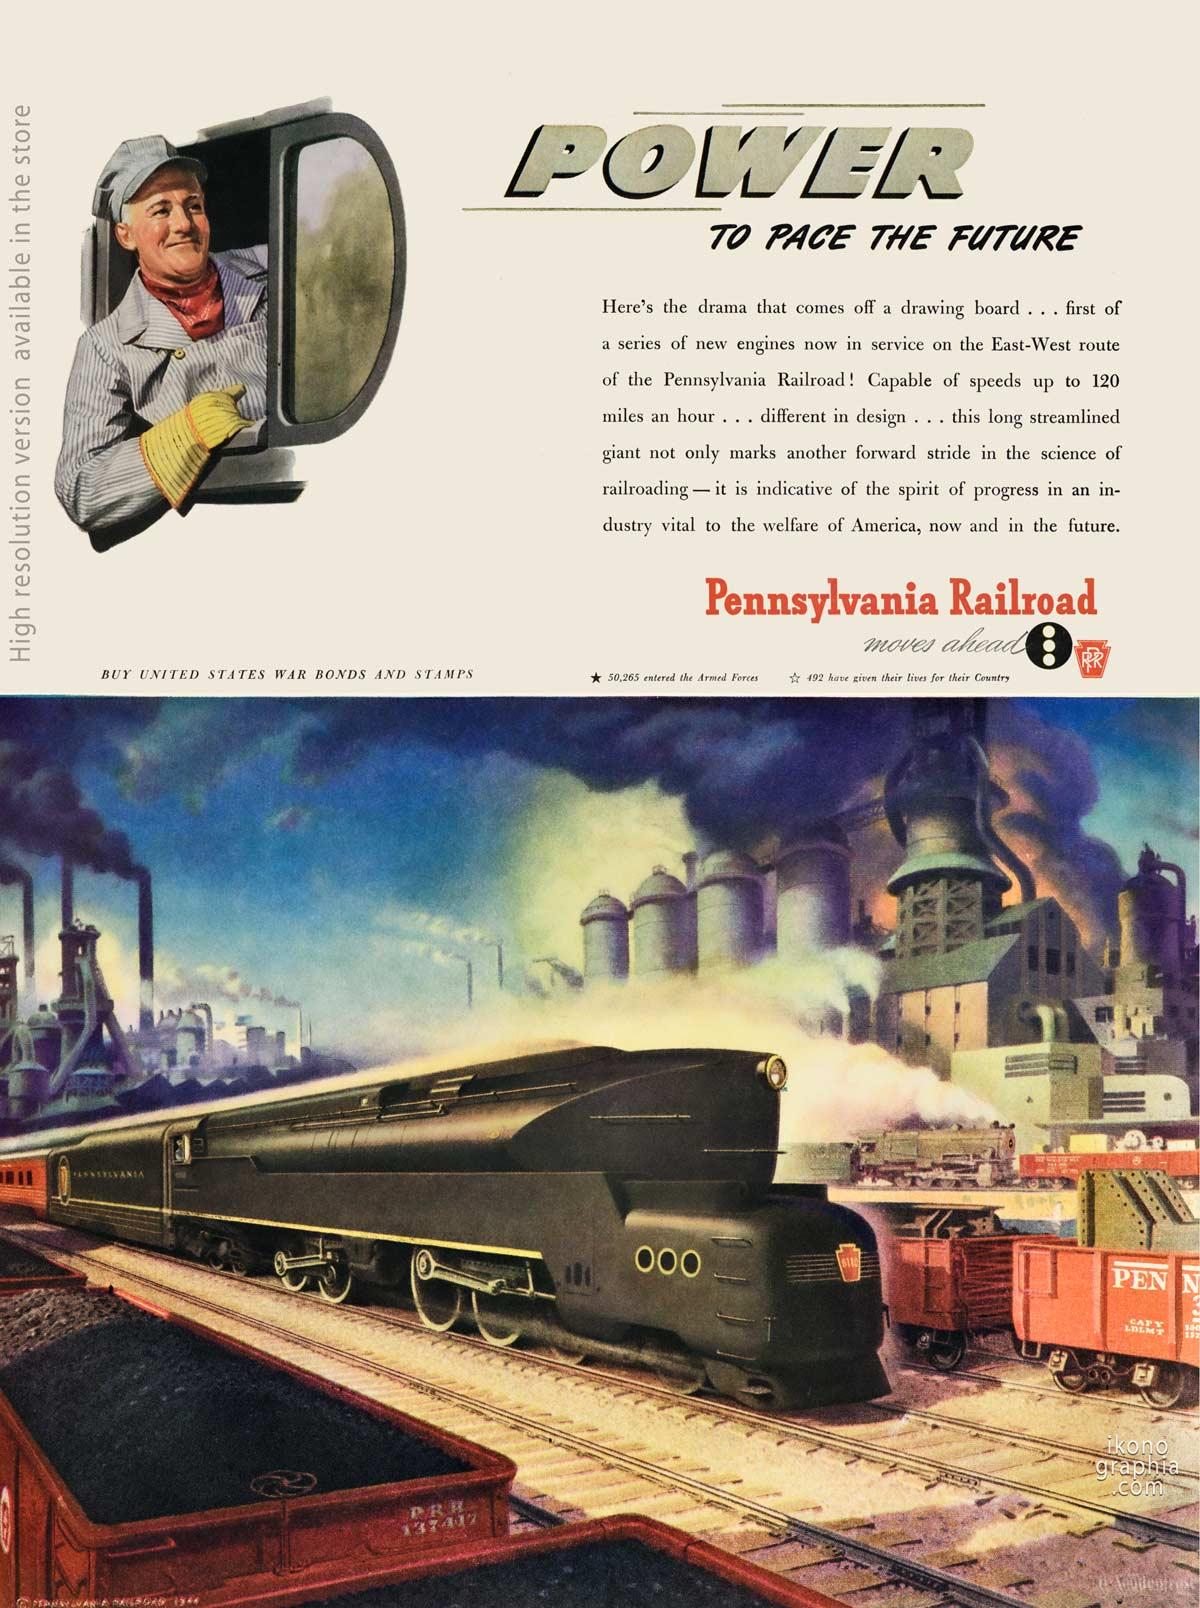 Power to Pace the future - Pennsylvania Railroad ad - Life Magazine. January 22, 1945